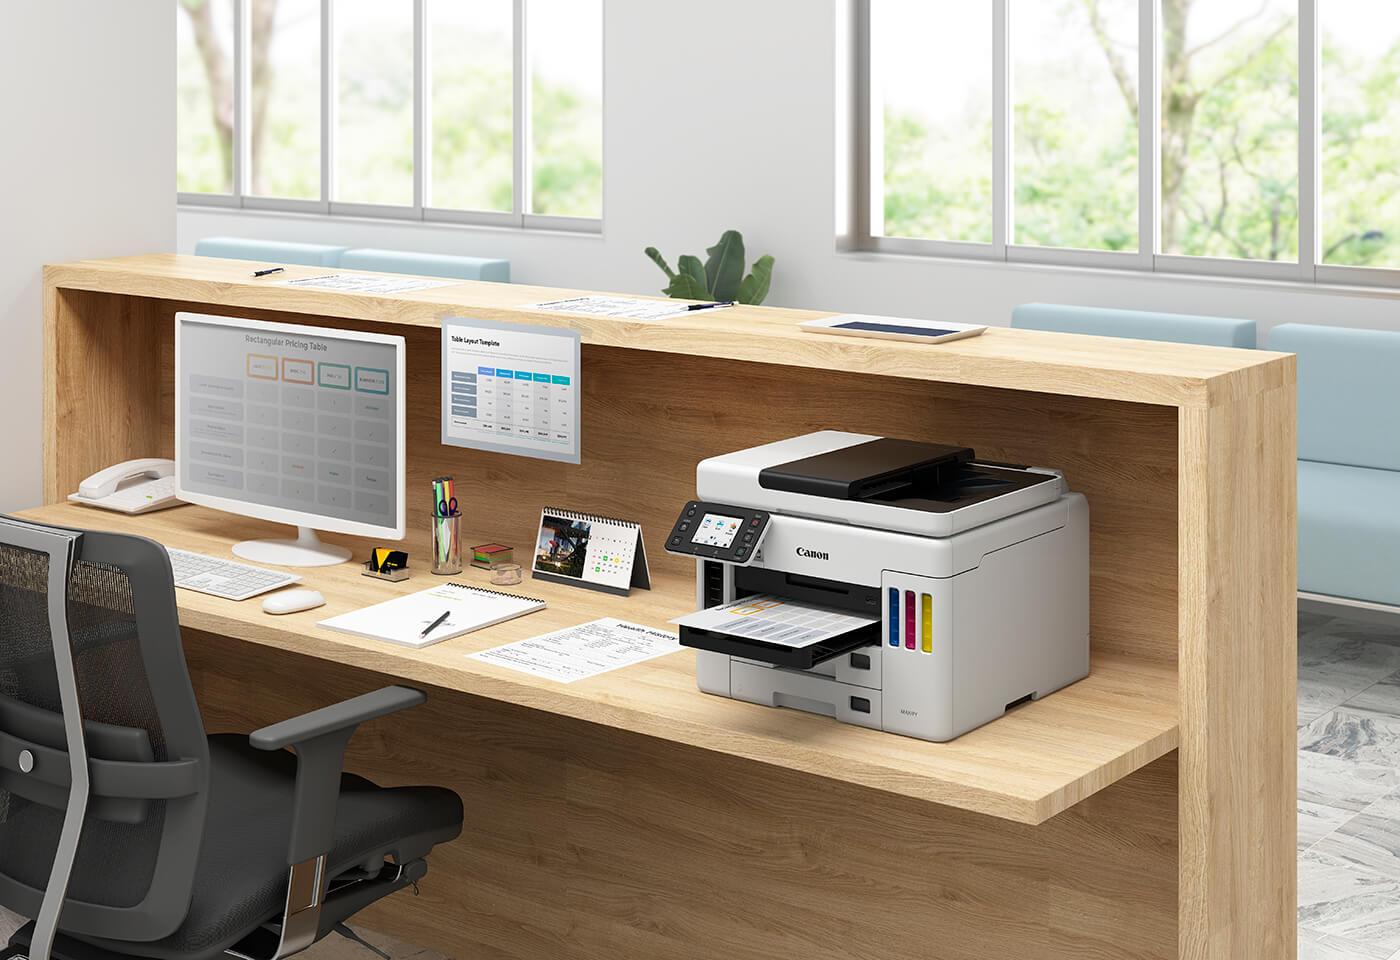 MAXIFY GX7060 MegaTank printer on work desk